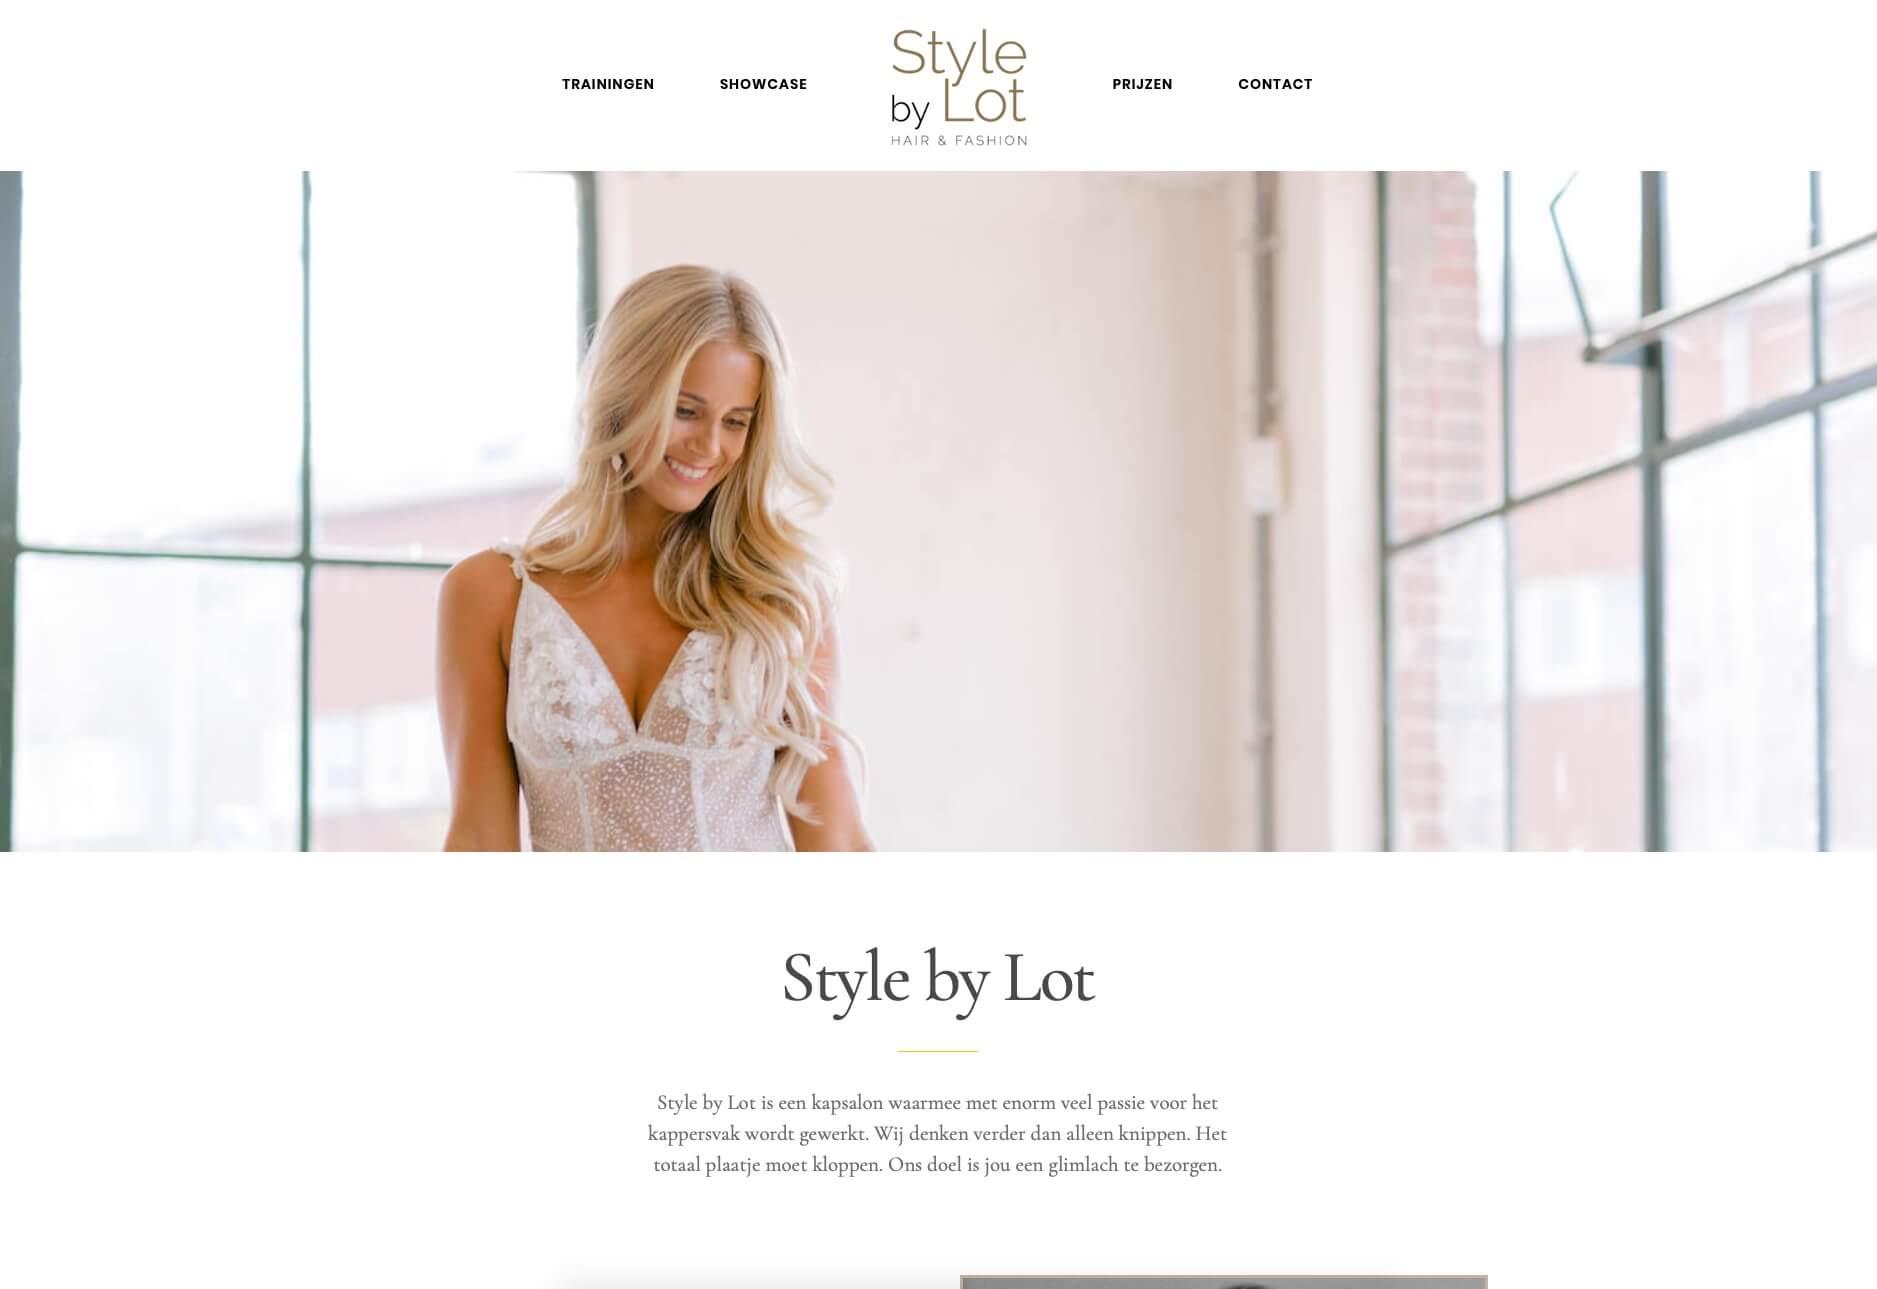 Style by Lot - Kapsalon Almelo - Website realisatie Obviousmedia.nl